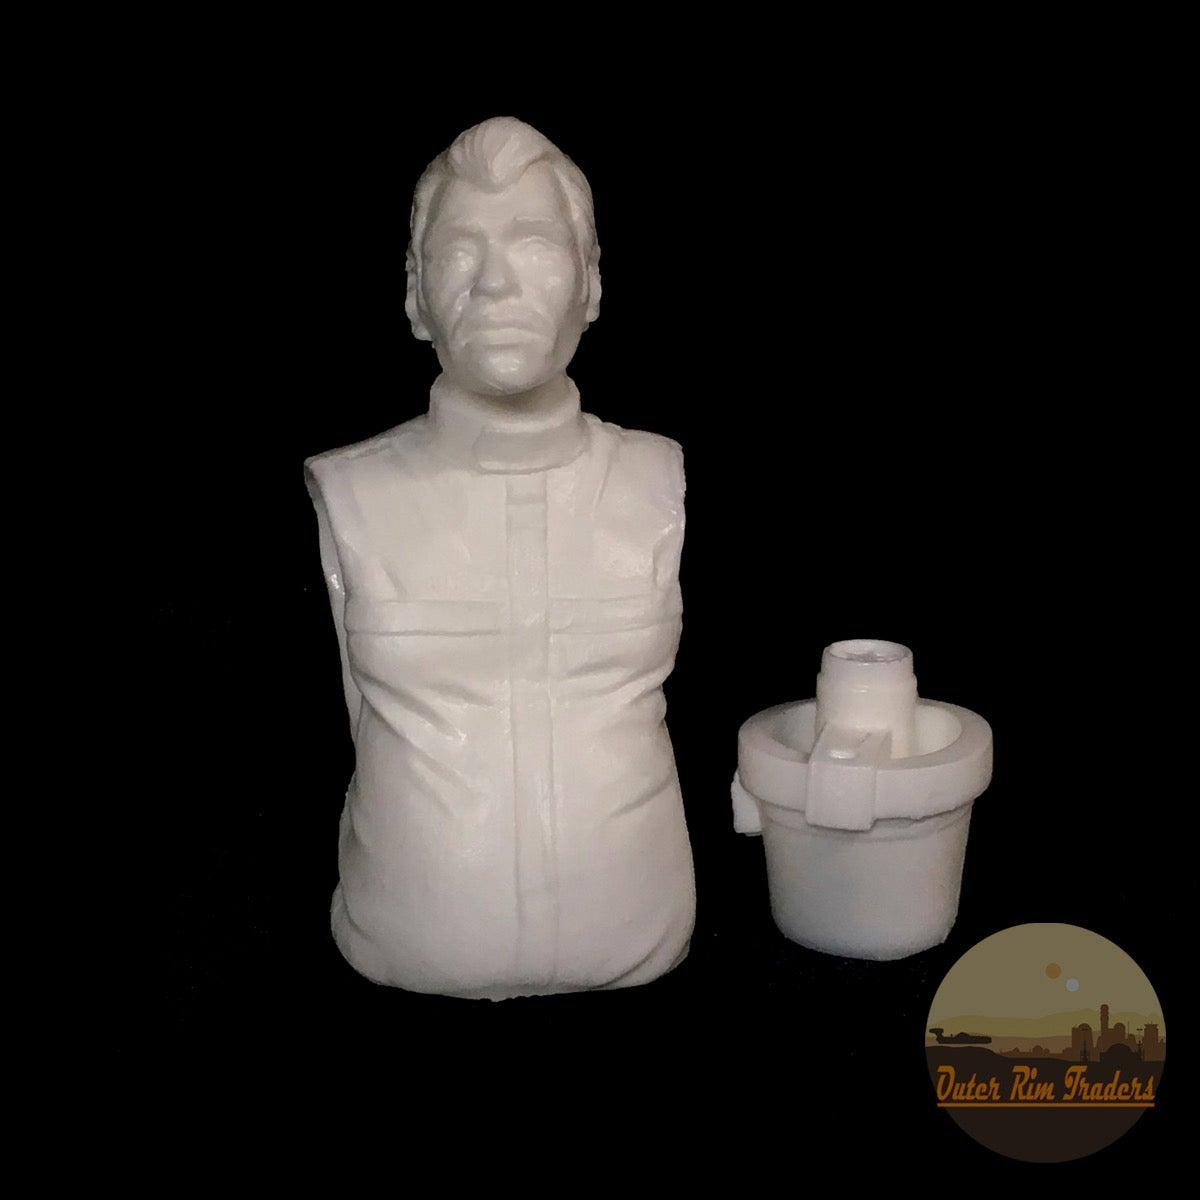 Image of Ice Cream Maker